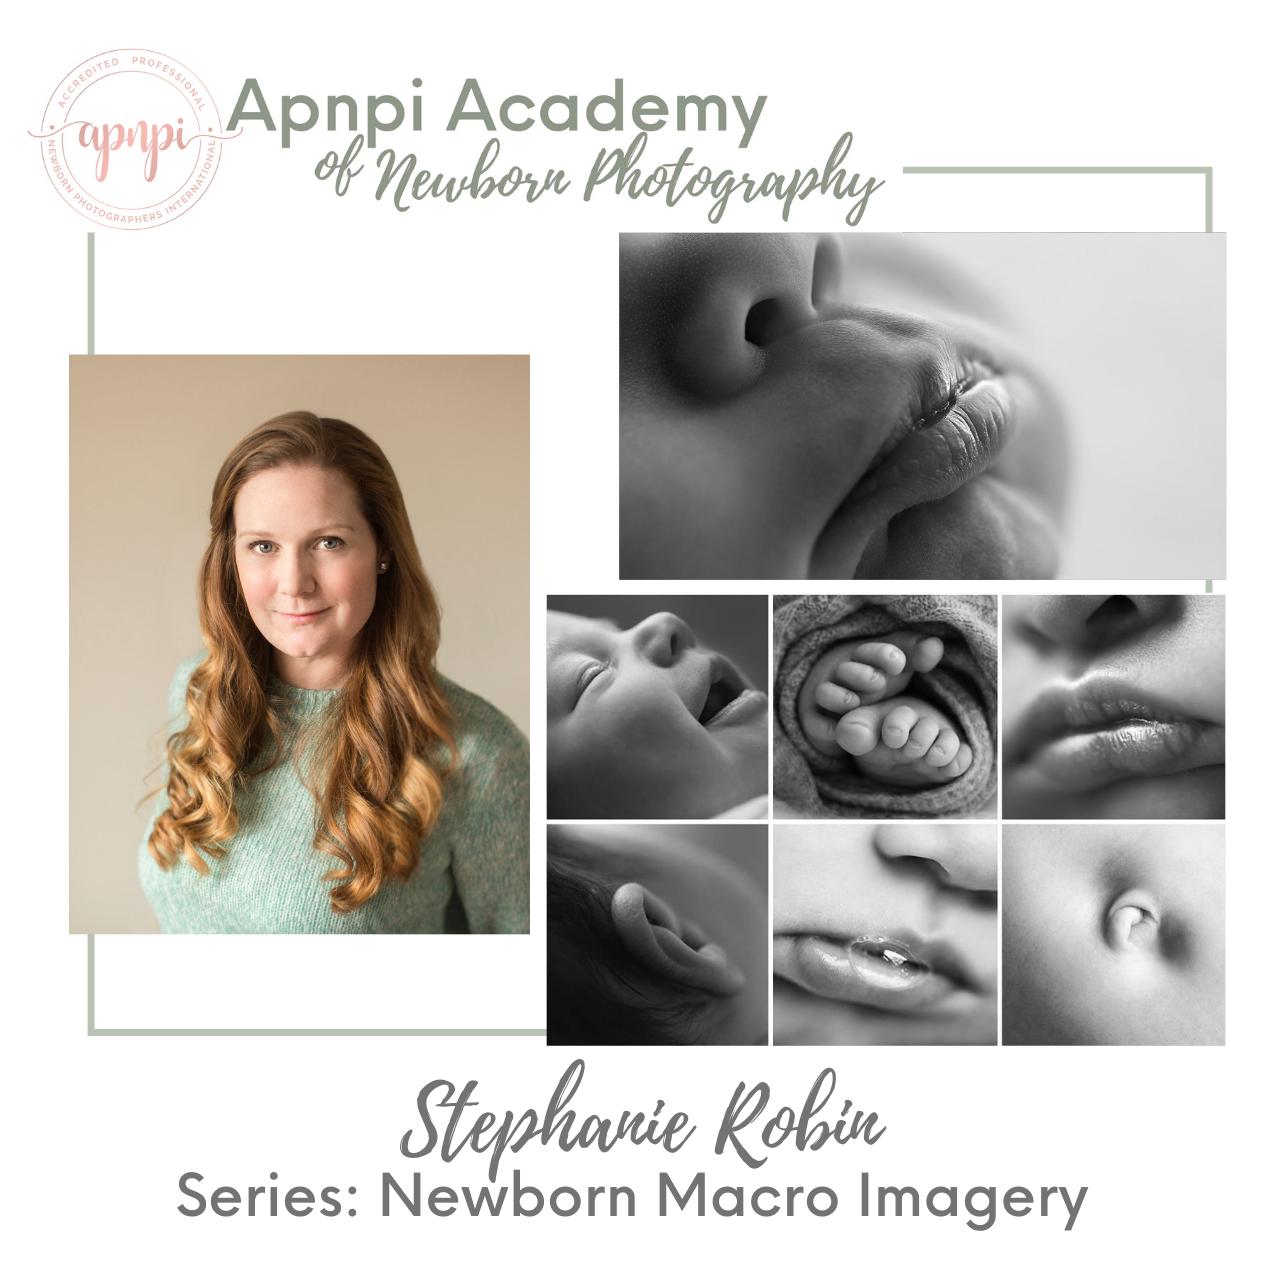 Stephanie Robin Newborn Photography Macro Imagery APNPI Academy Course